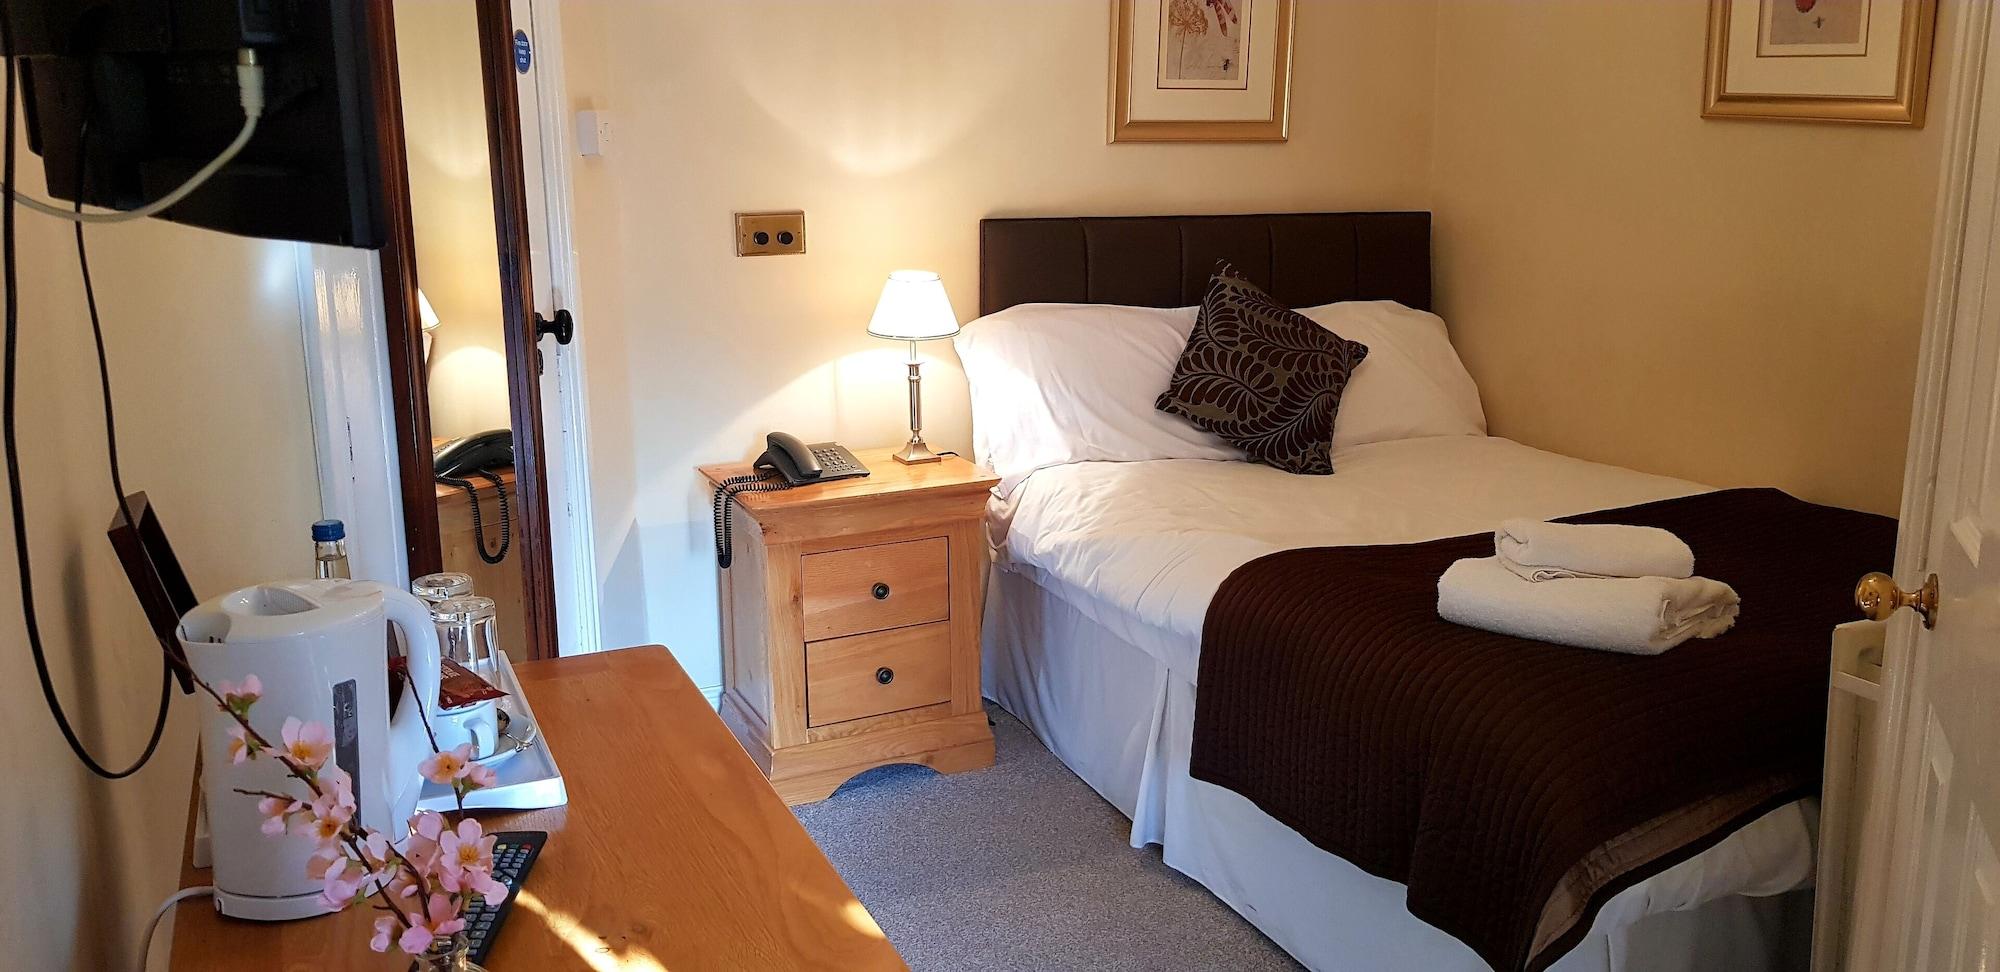 The Blenheim House Hotel, Derbyshire